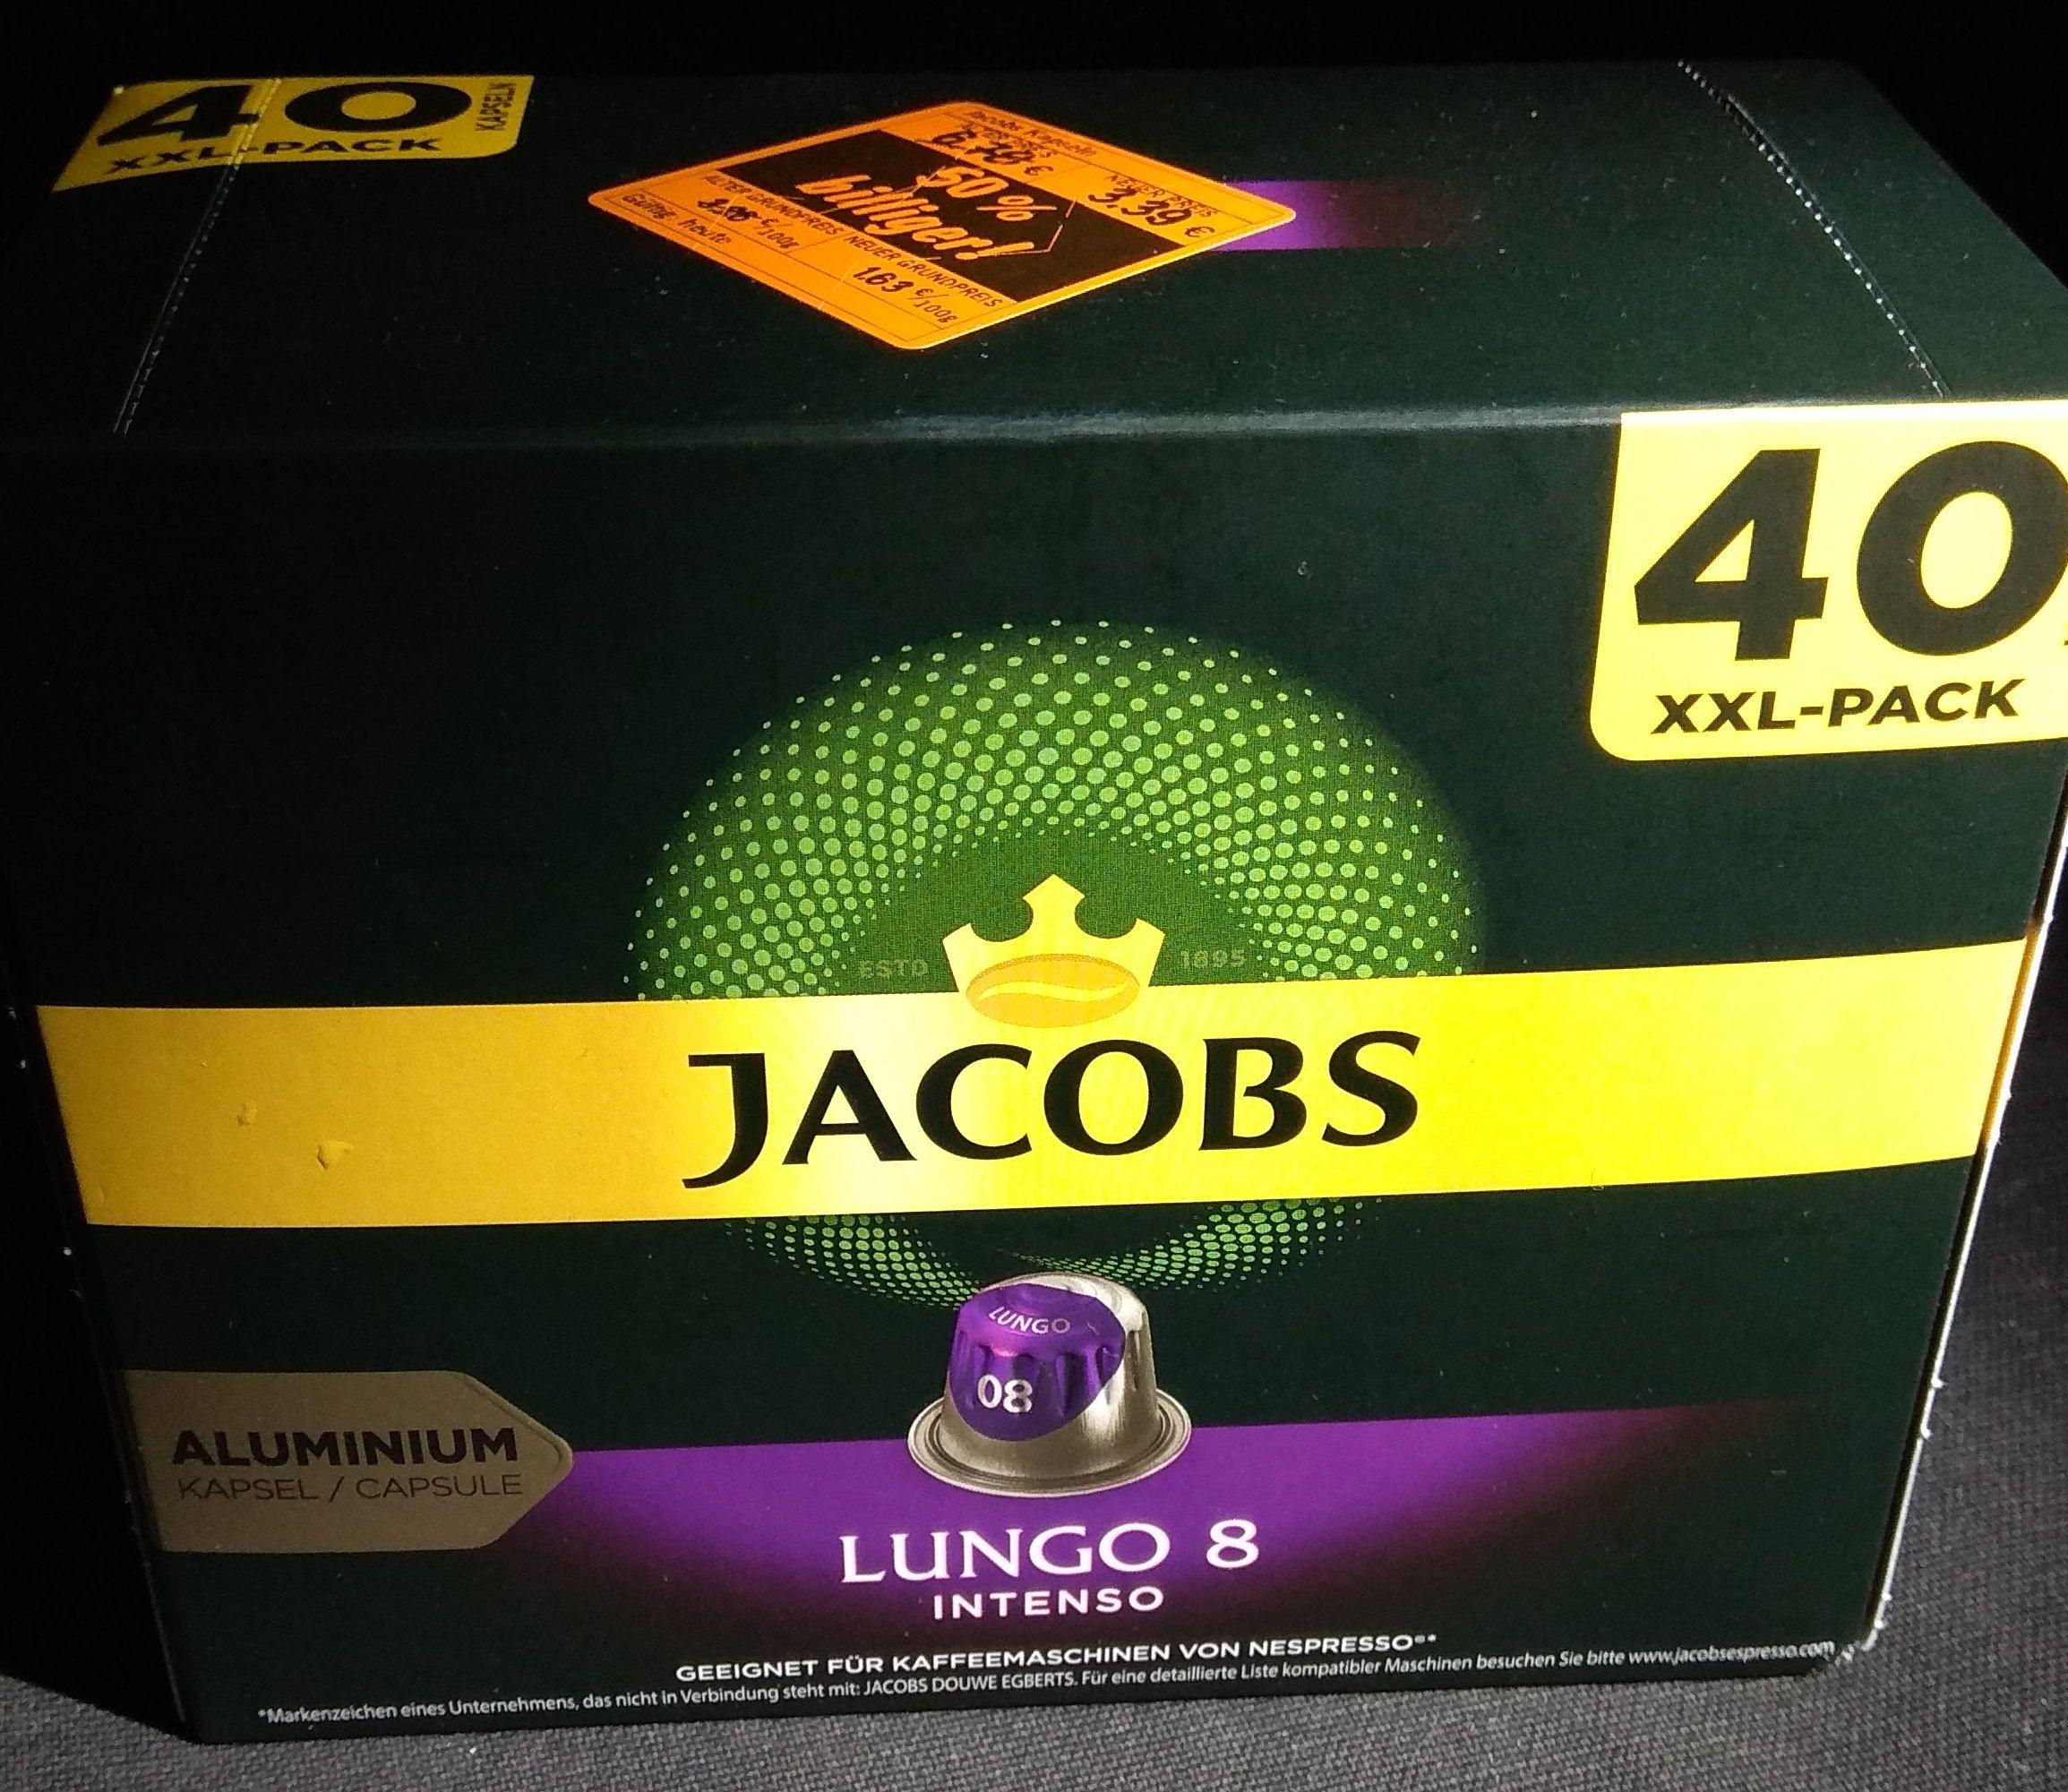 [LIDL Gau-Odernheim] Jacobs Nespresso Kapseln 40er Pack